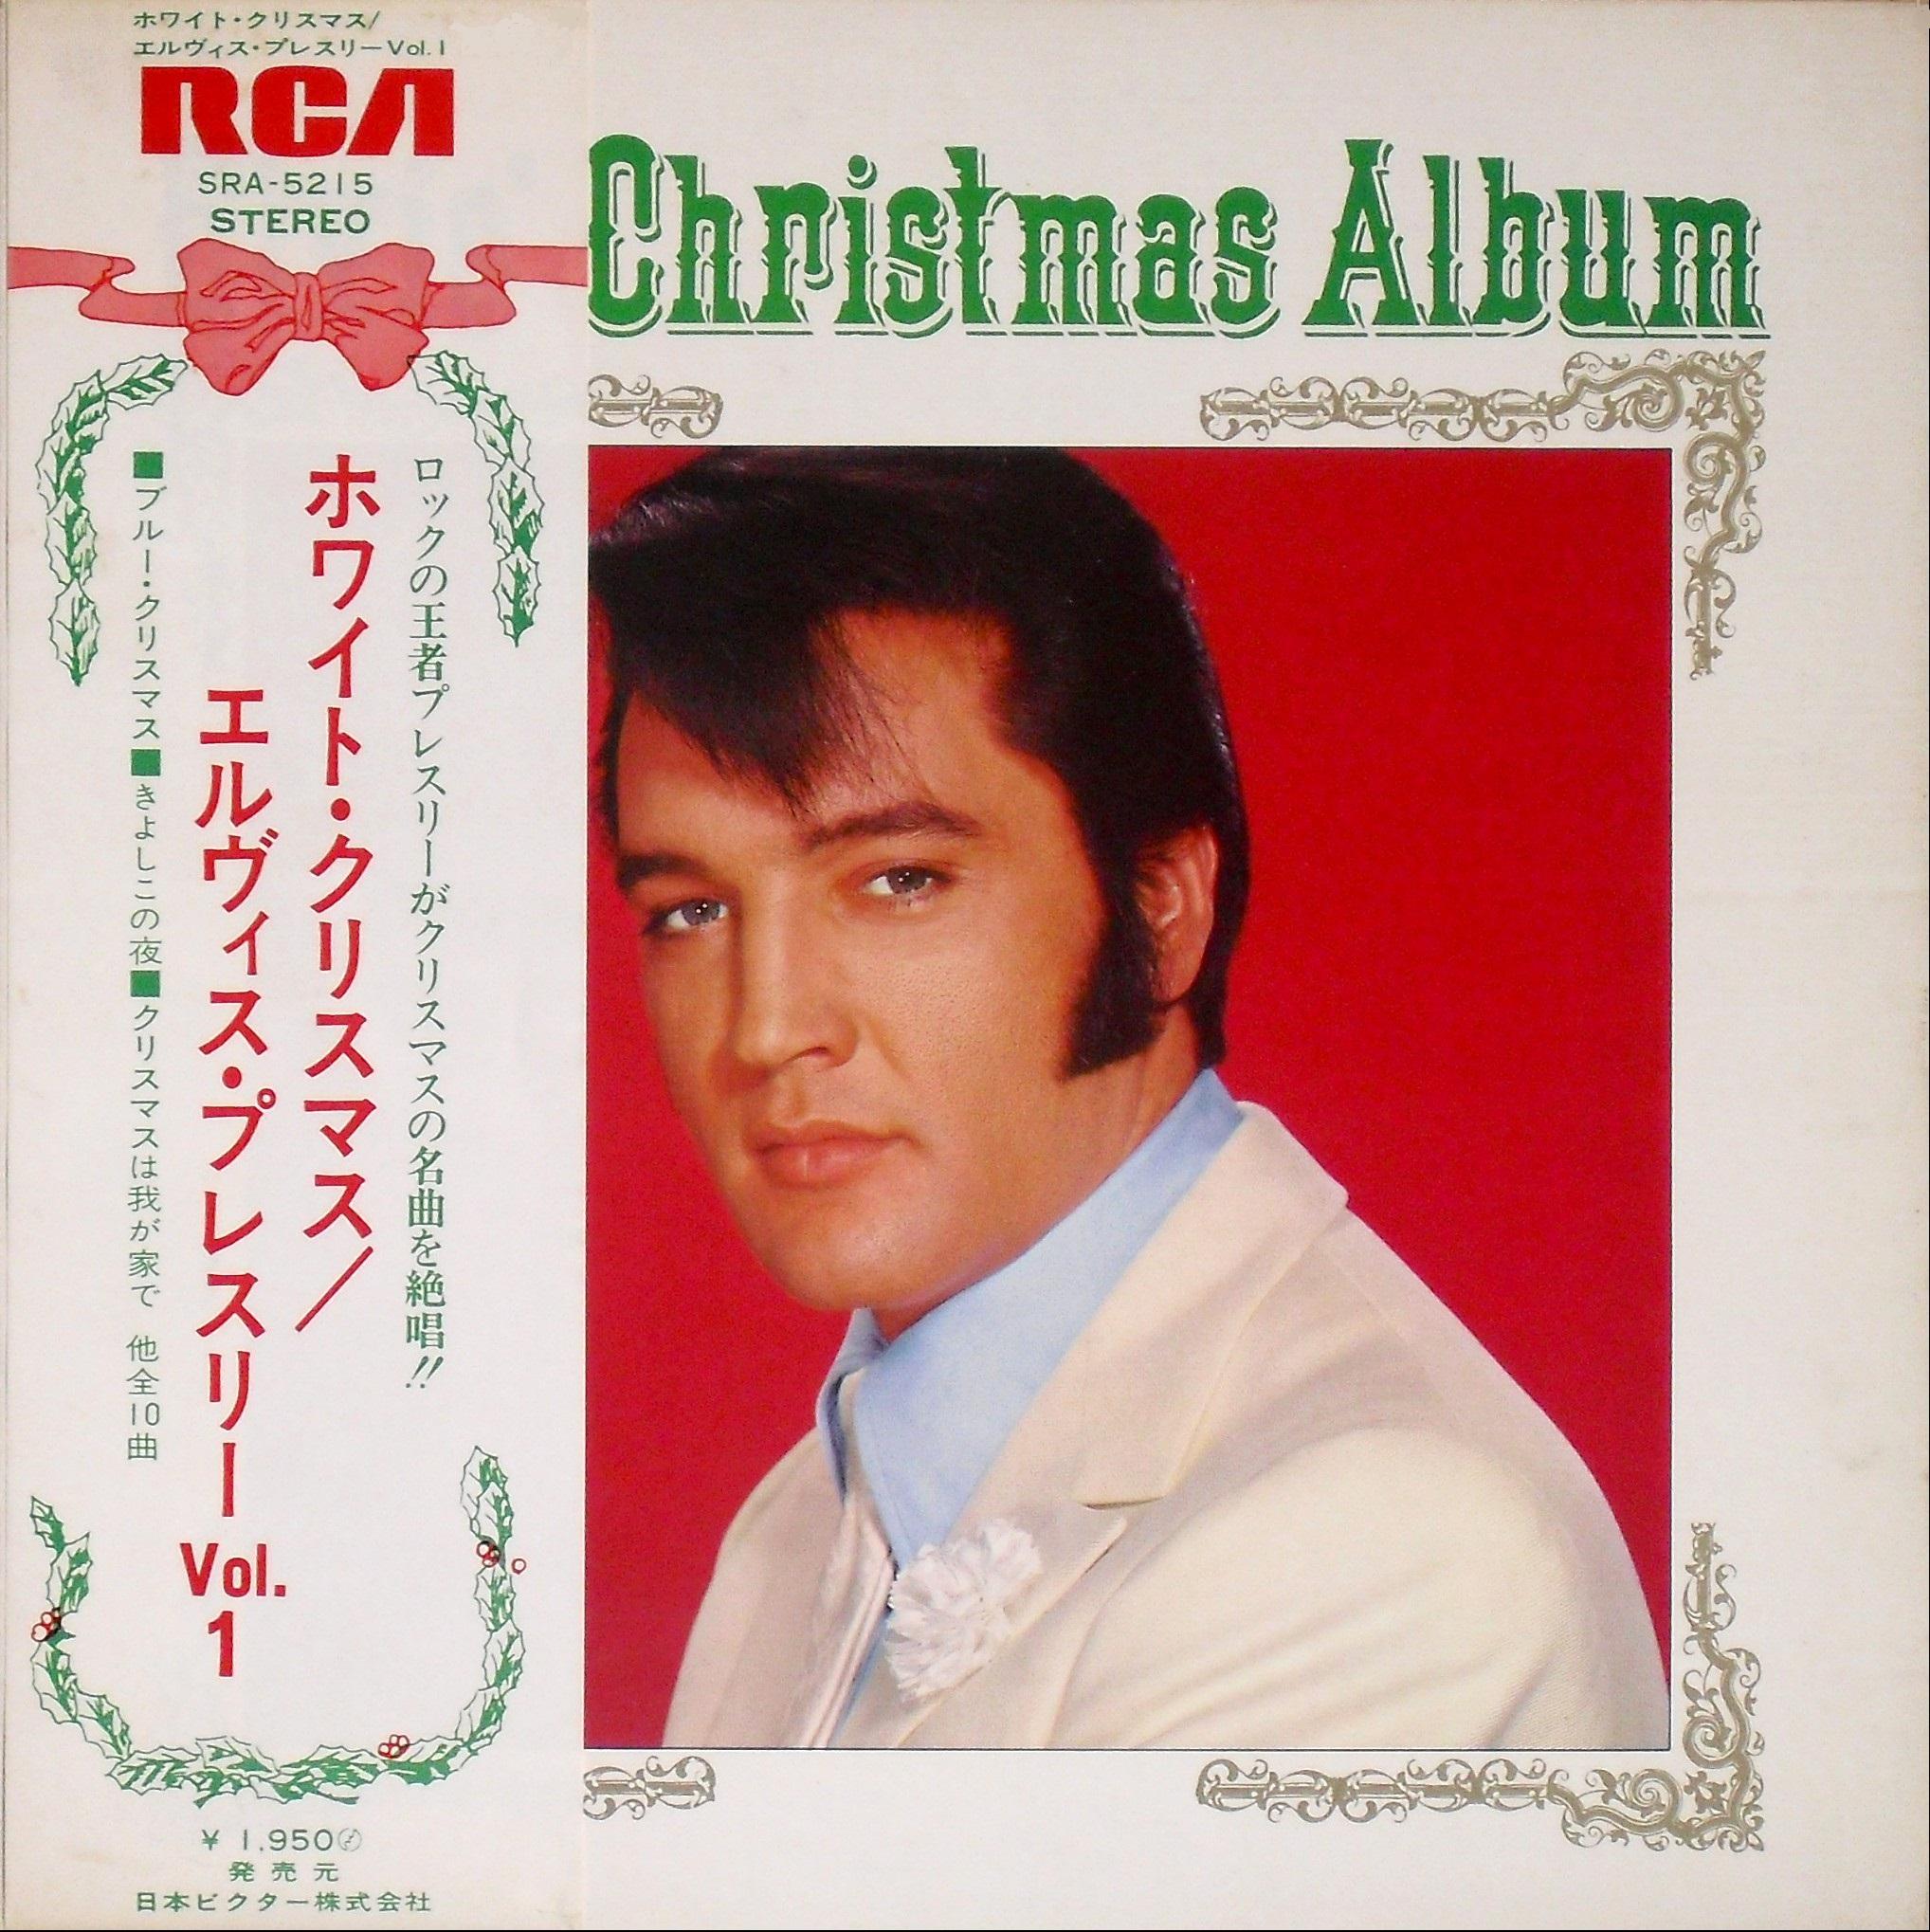 ELVIS' CHRISTMAS ALBUM 01jzsd6